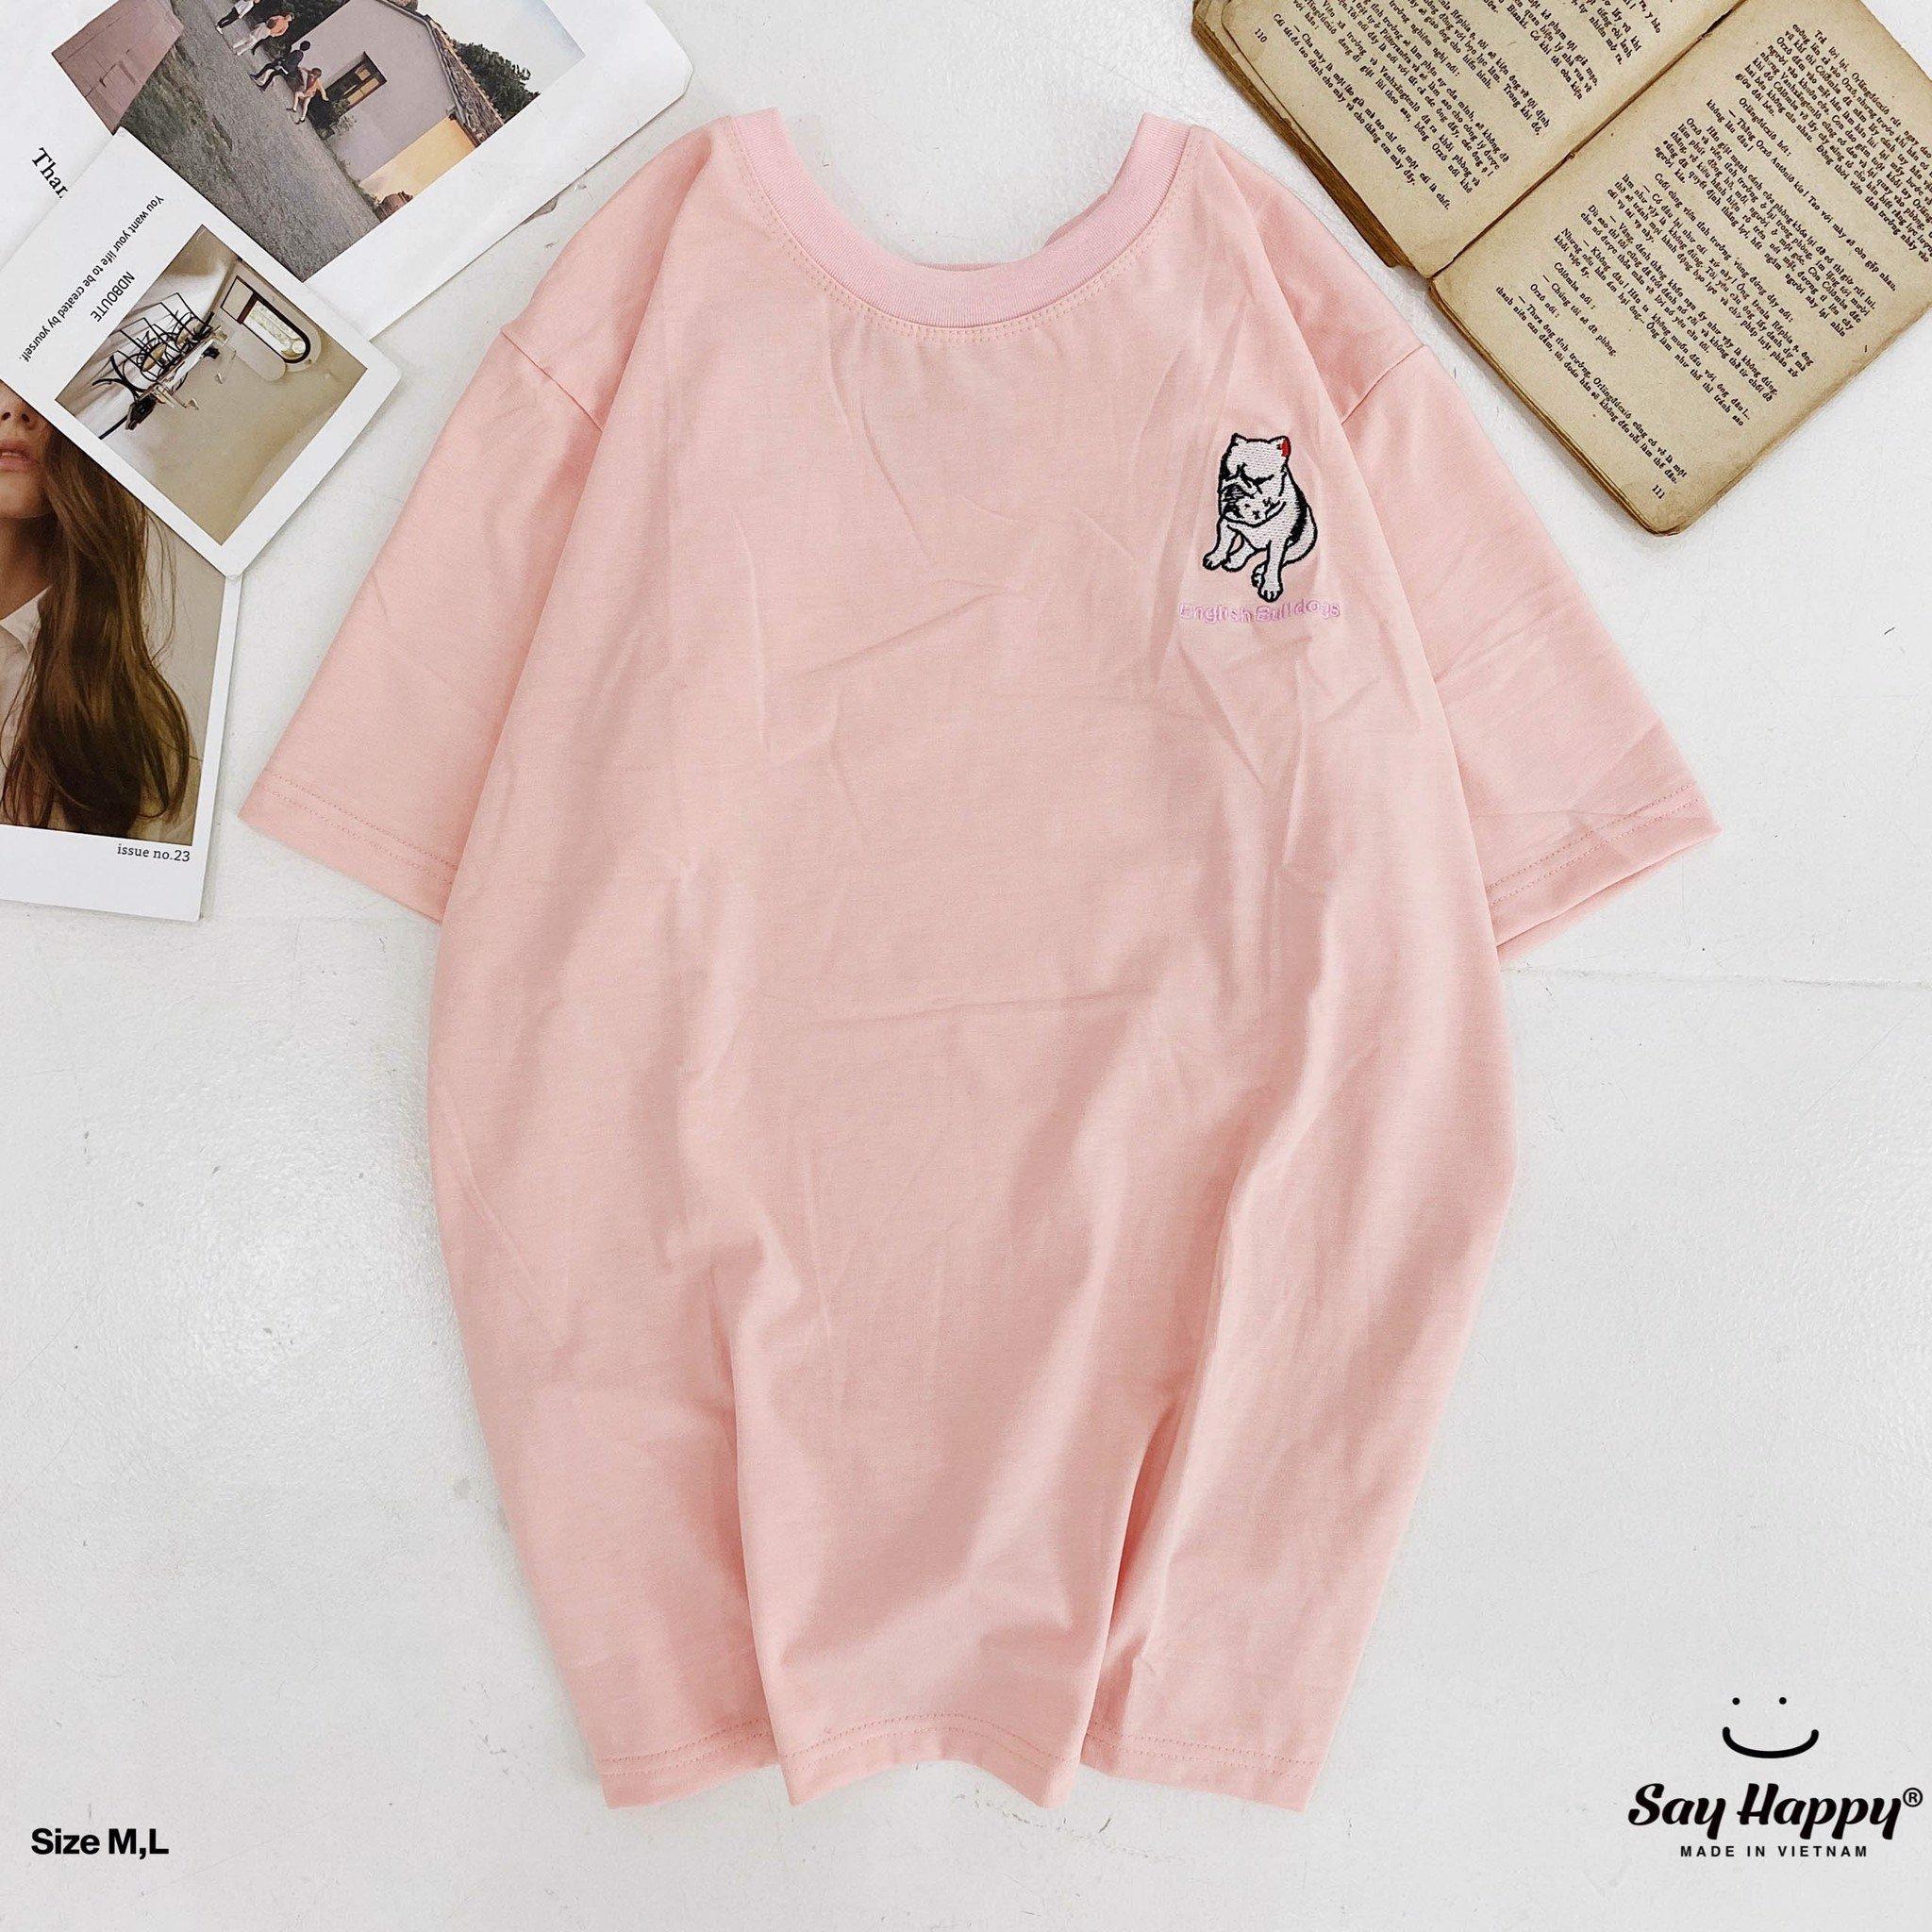 Say Happy Tshirt - Áo thun hồng form medium thêu